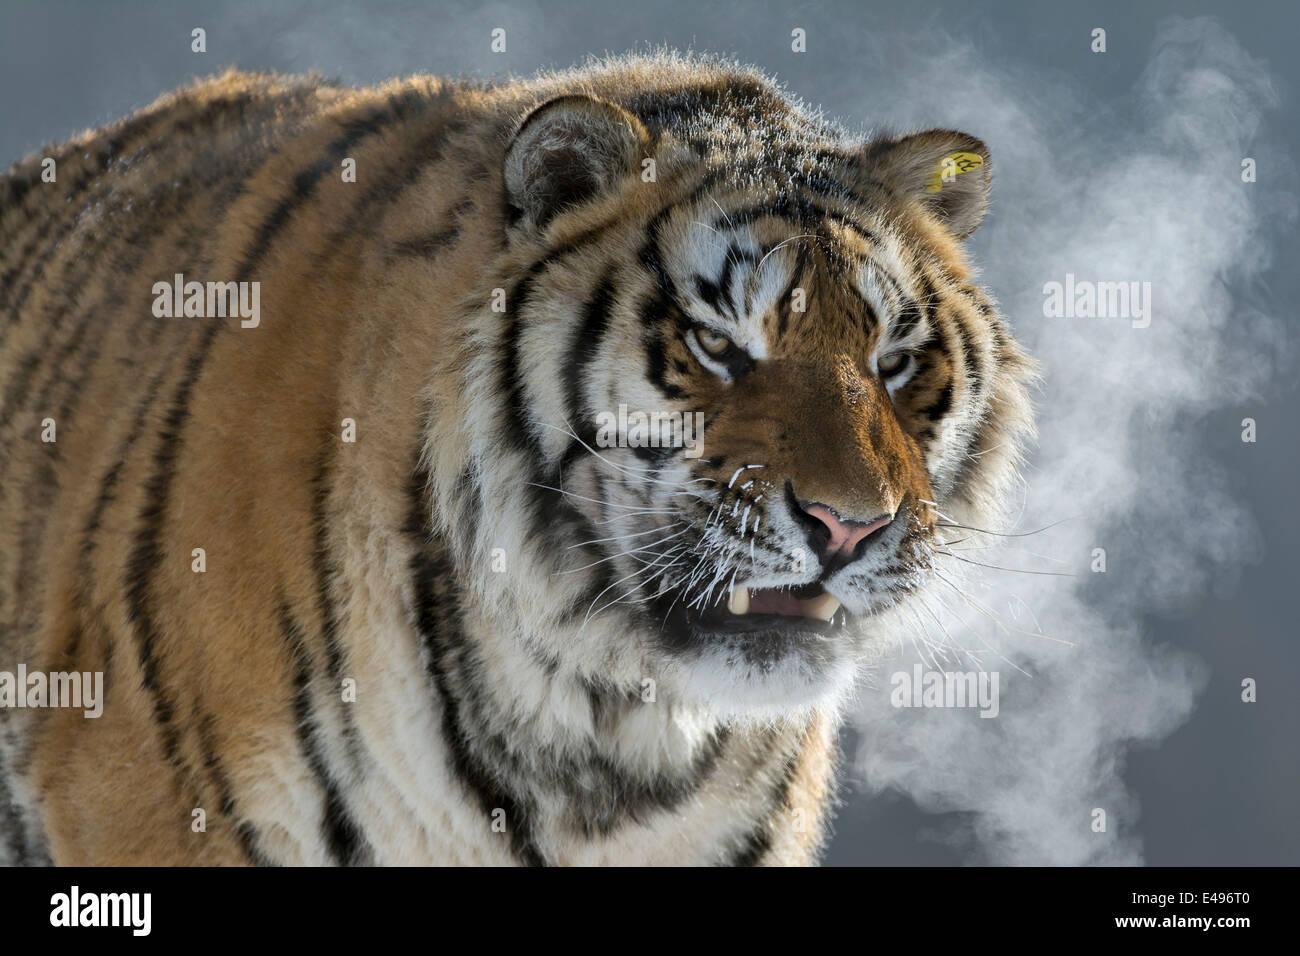 Grimacing Siberian tiger in the extreme cold, Hengdaohezi Breeding Center, Mudanjiang, China - Stock Image